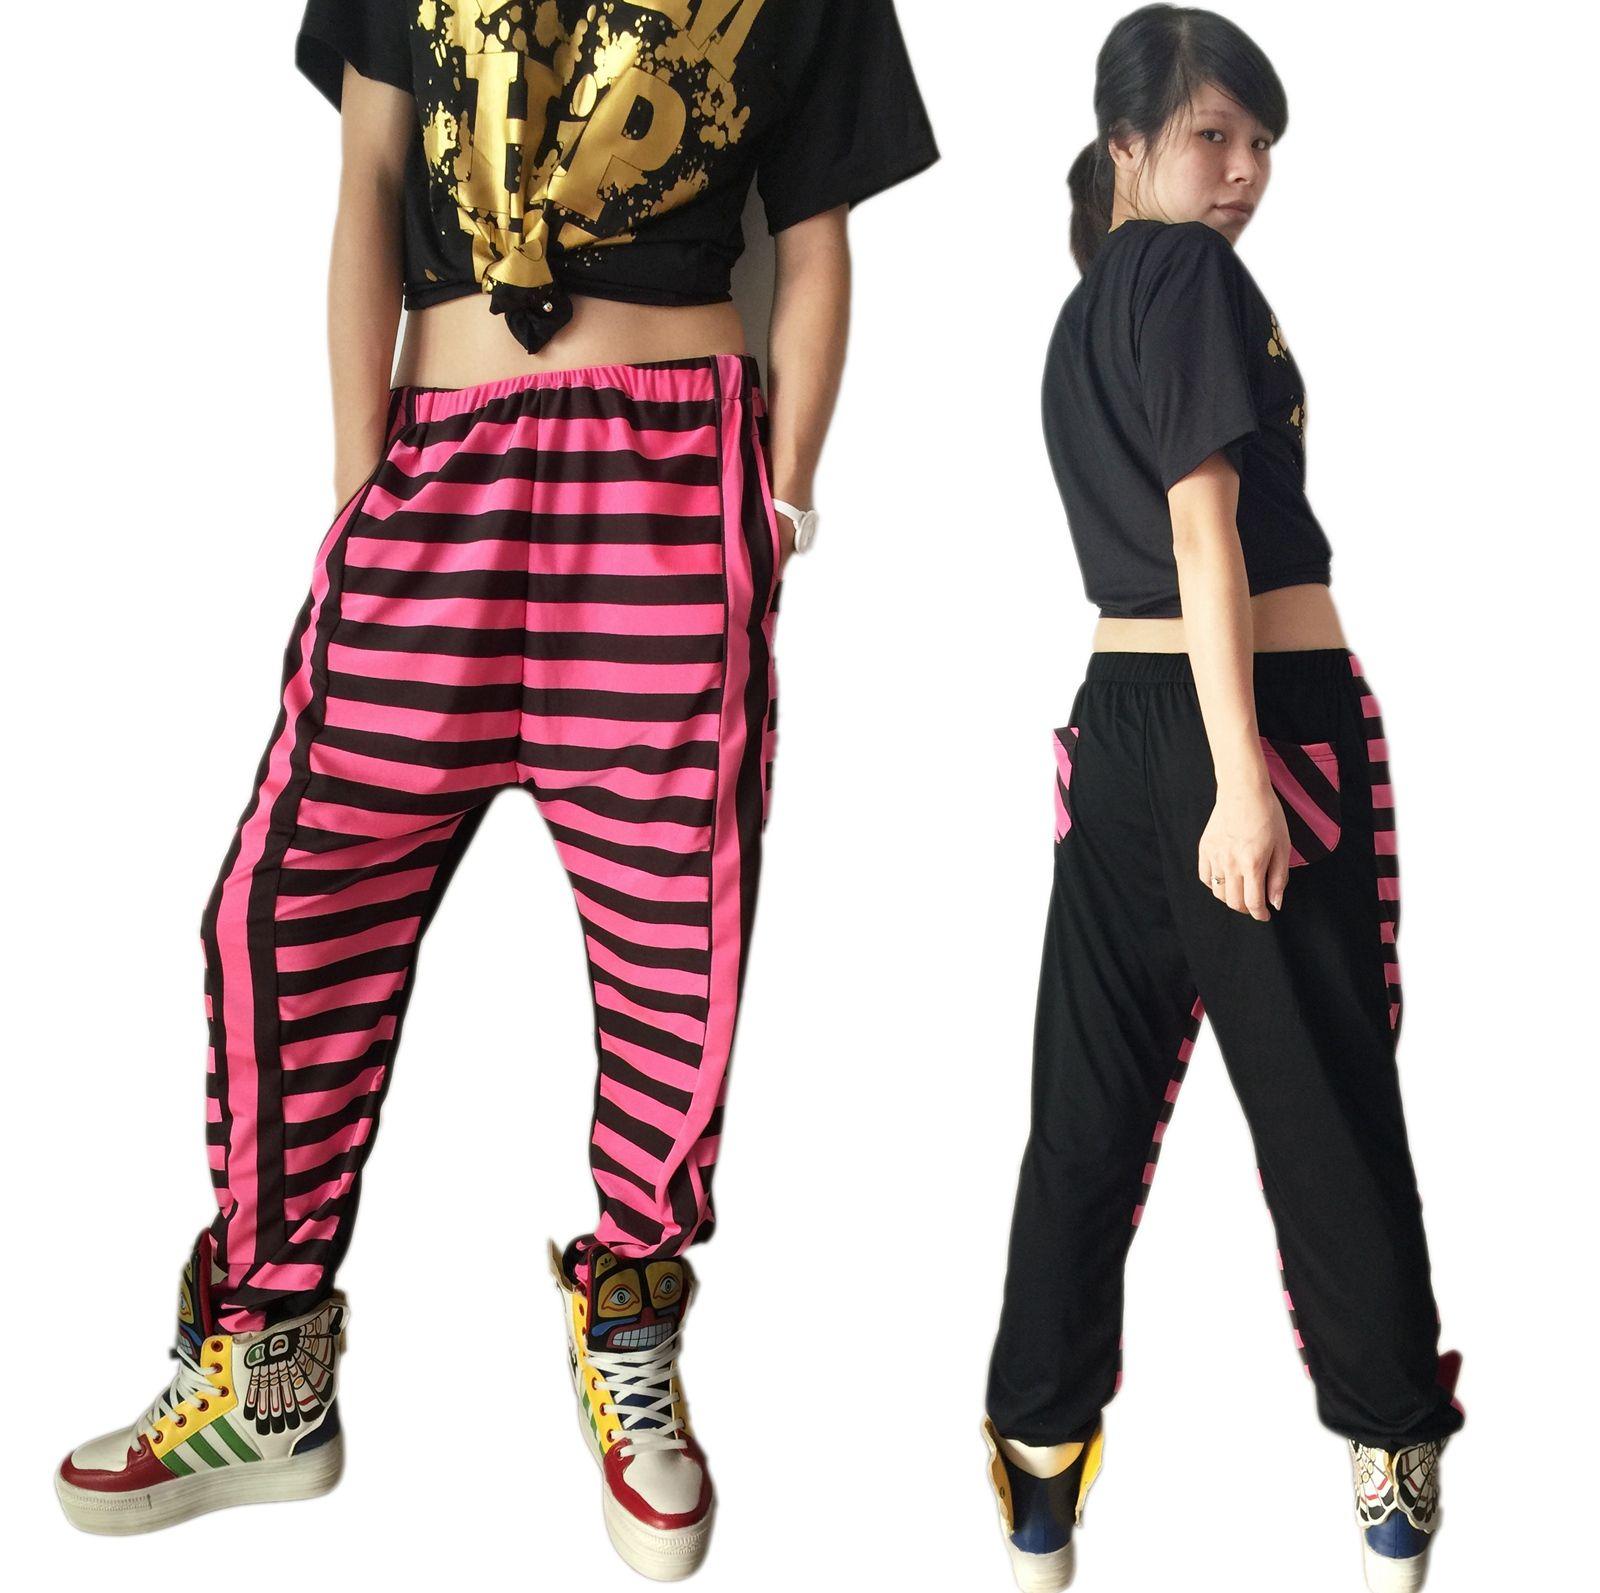 New fashion Harem Hip Hop Dance Pants casual Sweatpants Costumes female stage performance wear neon stripe jazz sports trousers